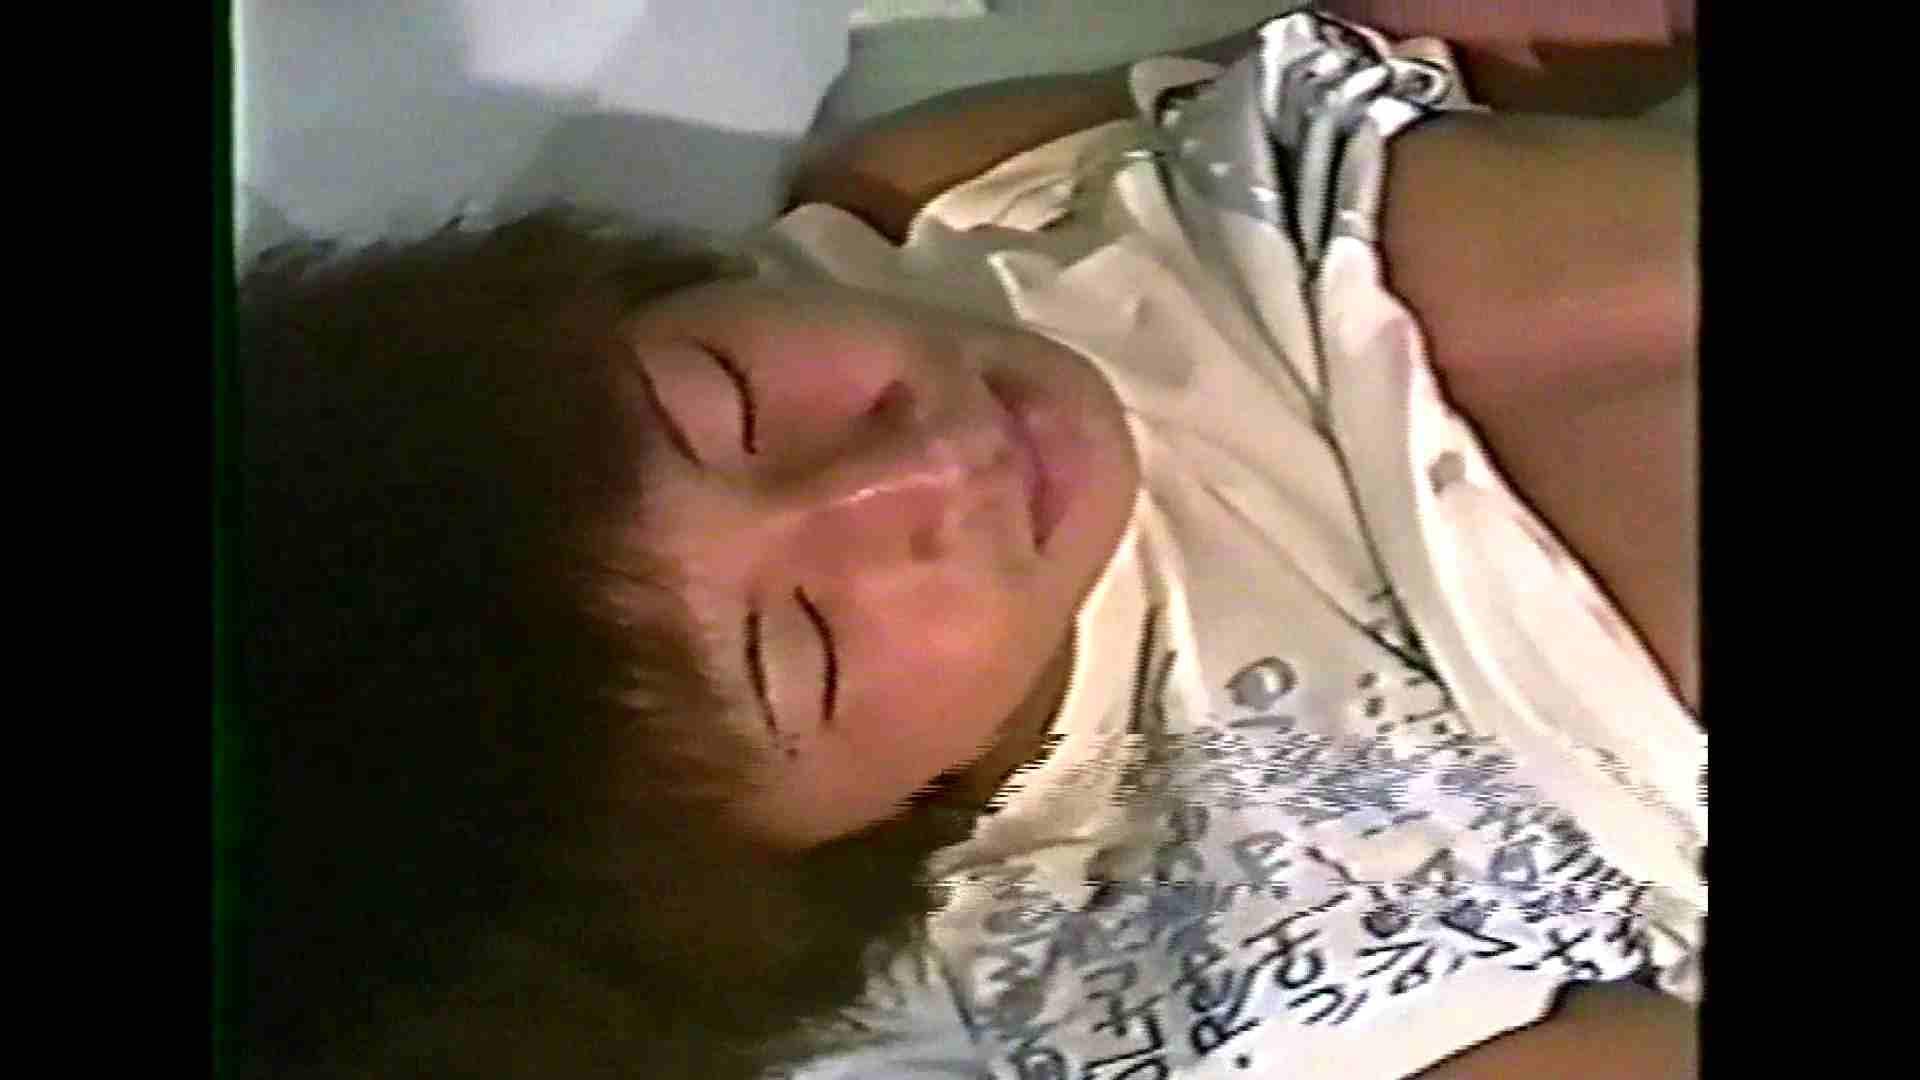 GAYBOY宏のオカズ倉庫Vol.3-1 完全無修正  89pic 14